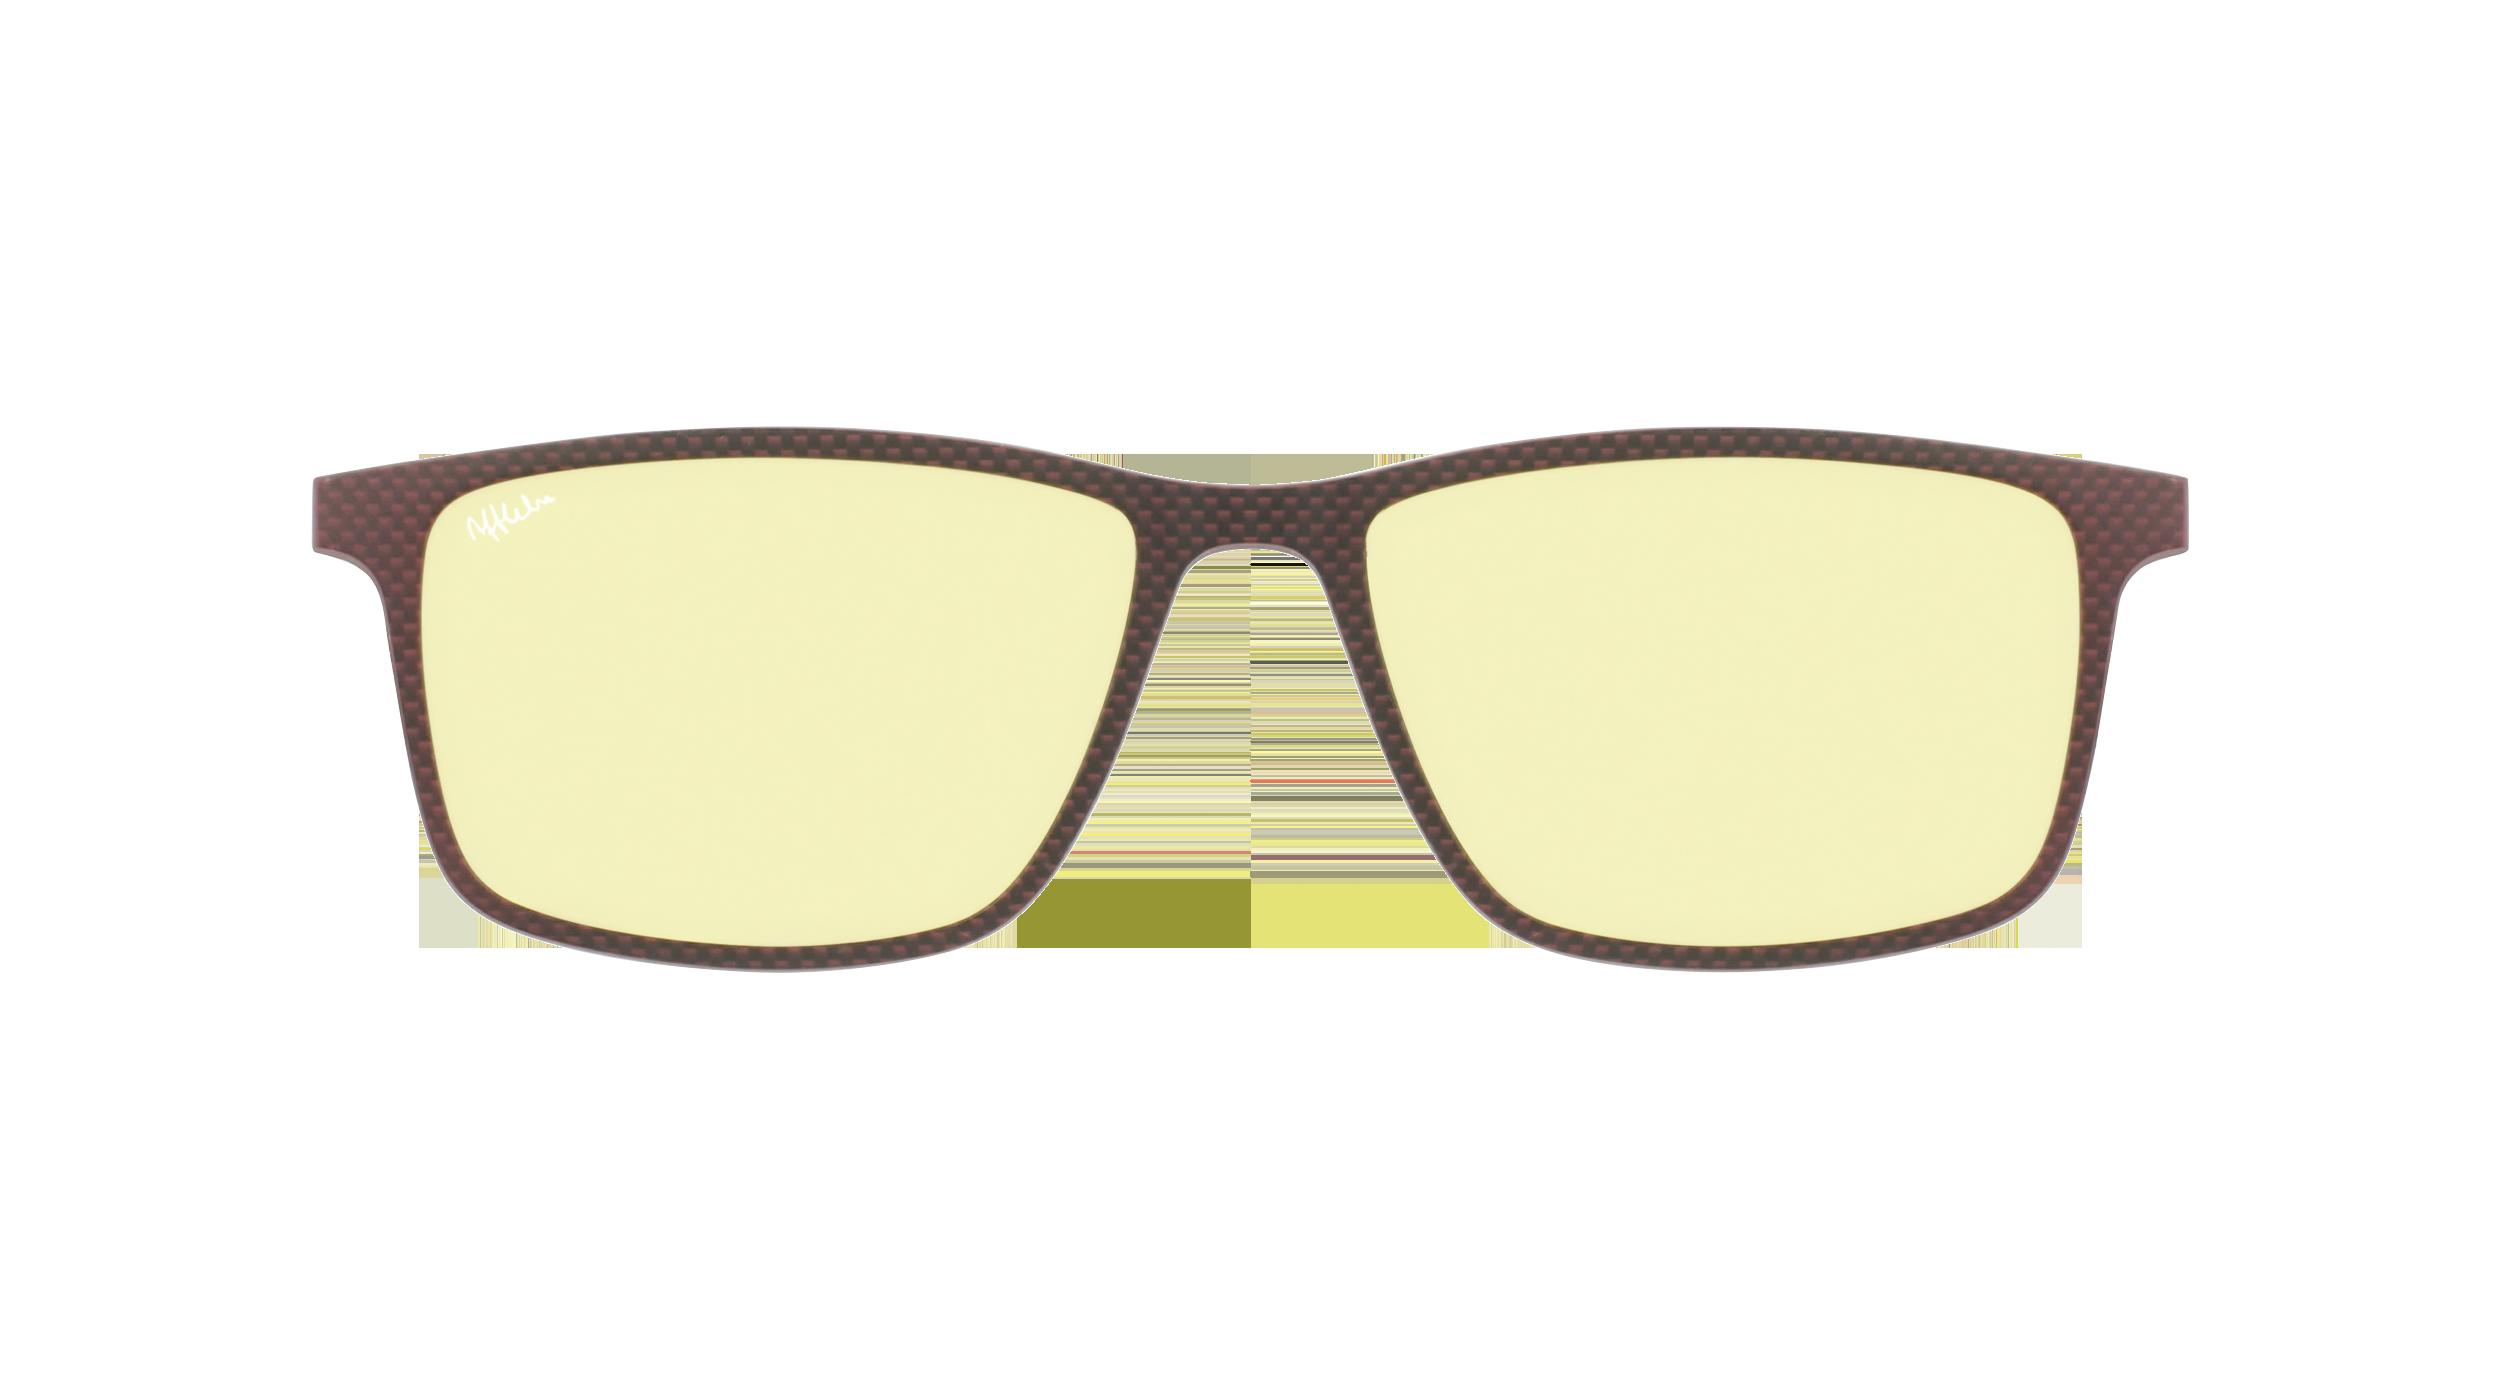 afflelou/france/products/smart_clip/clips_glasses/07630036457092.png